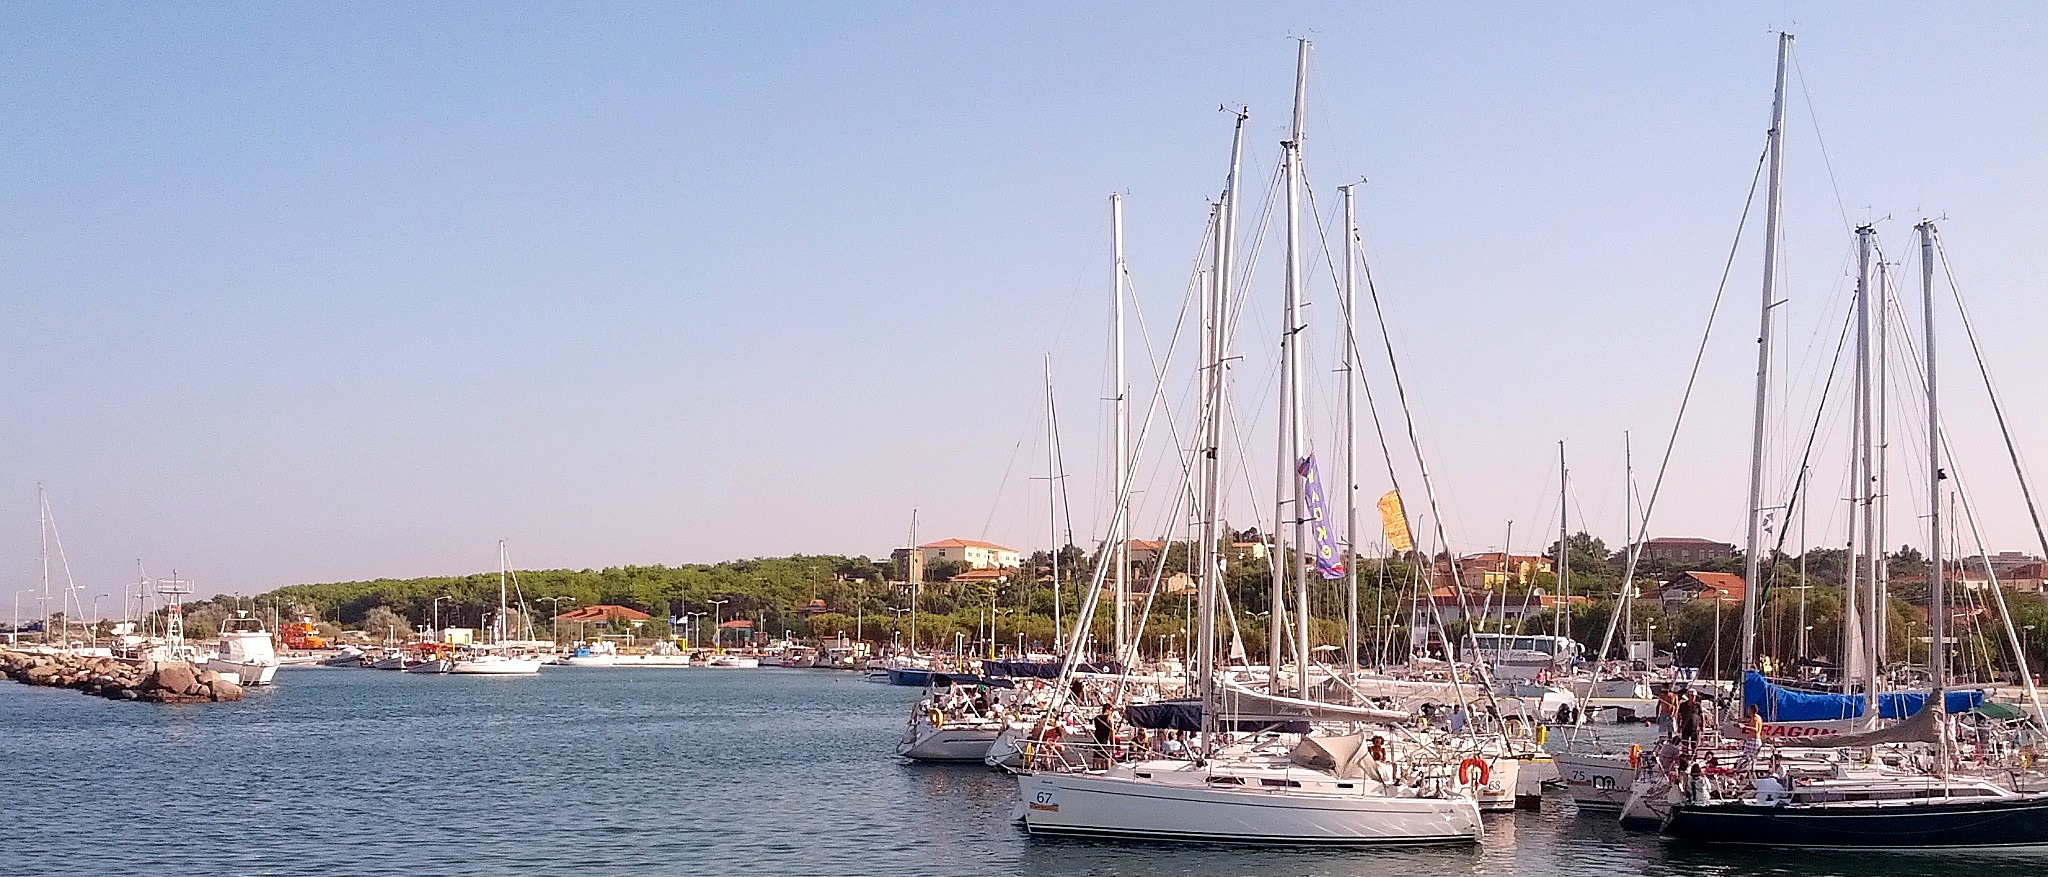 Noleggio Barche Moudros – Isola di Limnos - Navalia | Noleggia un Sogno